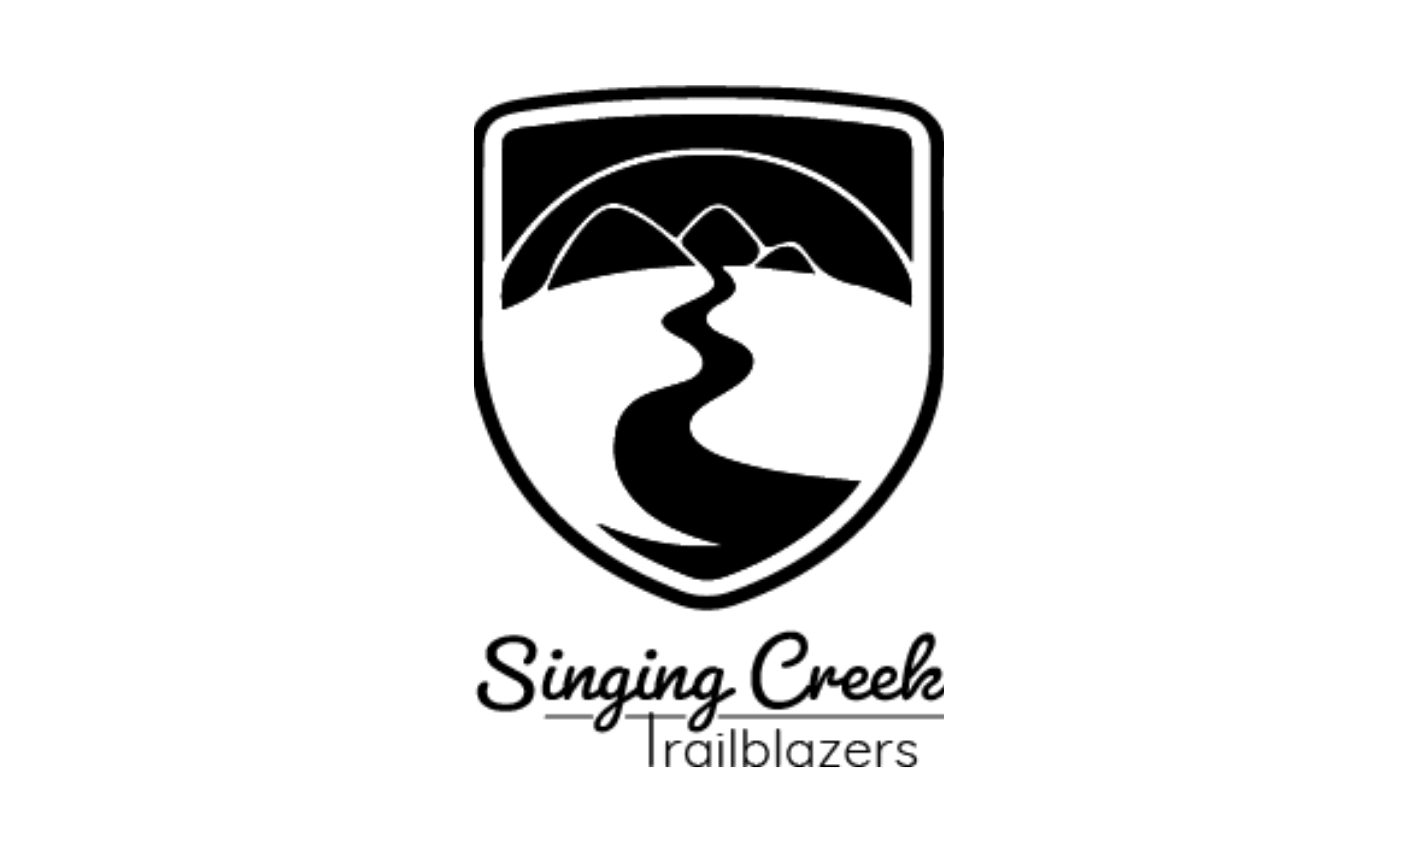 Singing Creek Trailblazers Logo Black